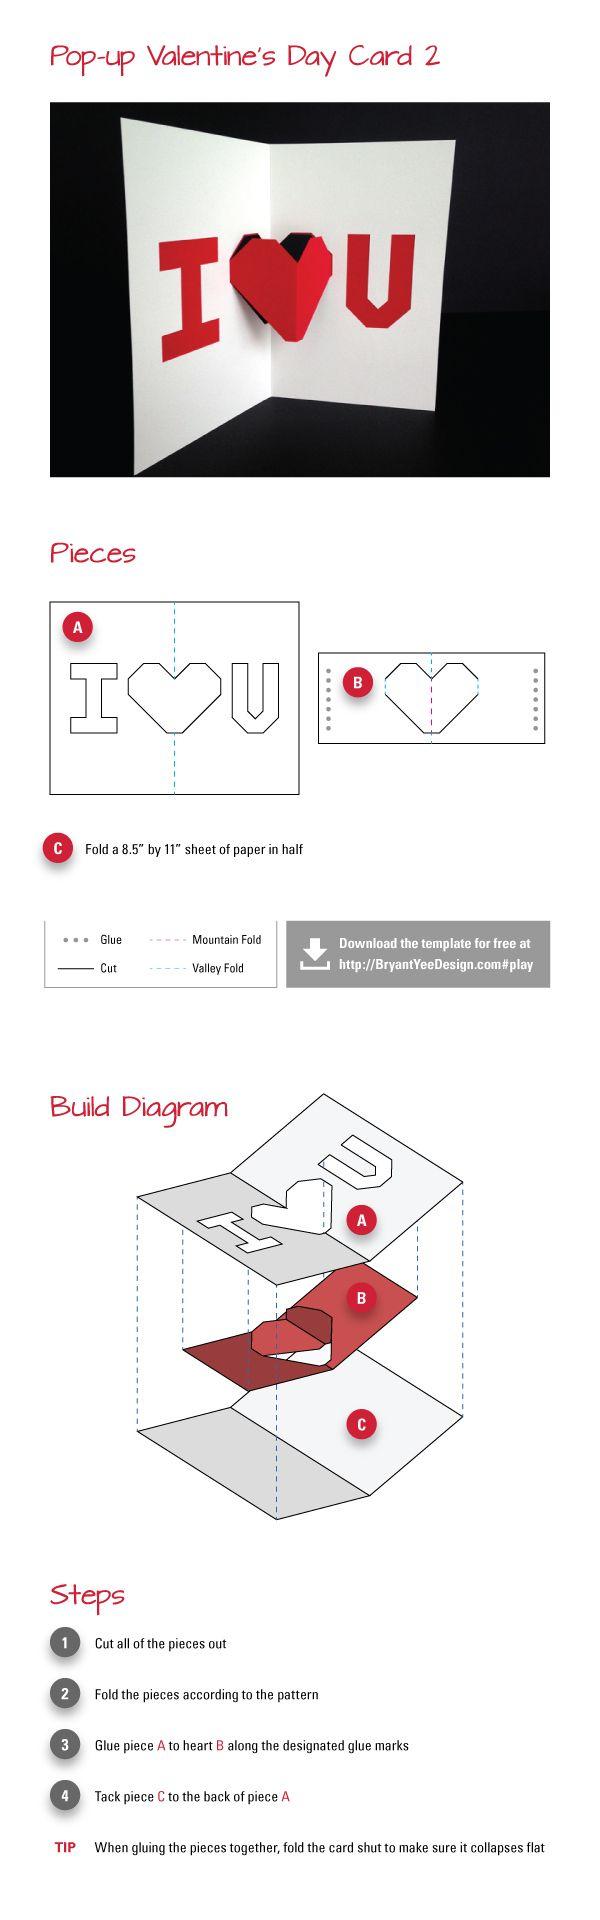 pop up valentines day cards pinterest